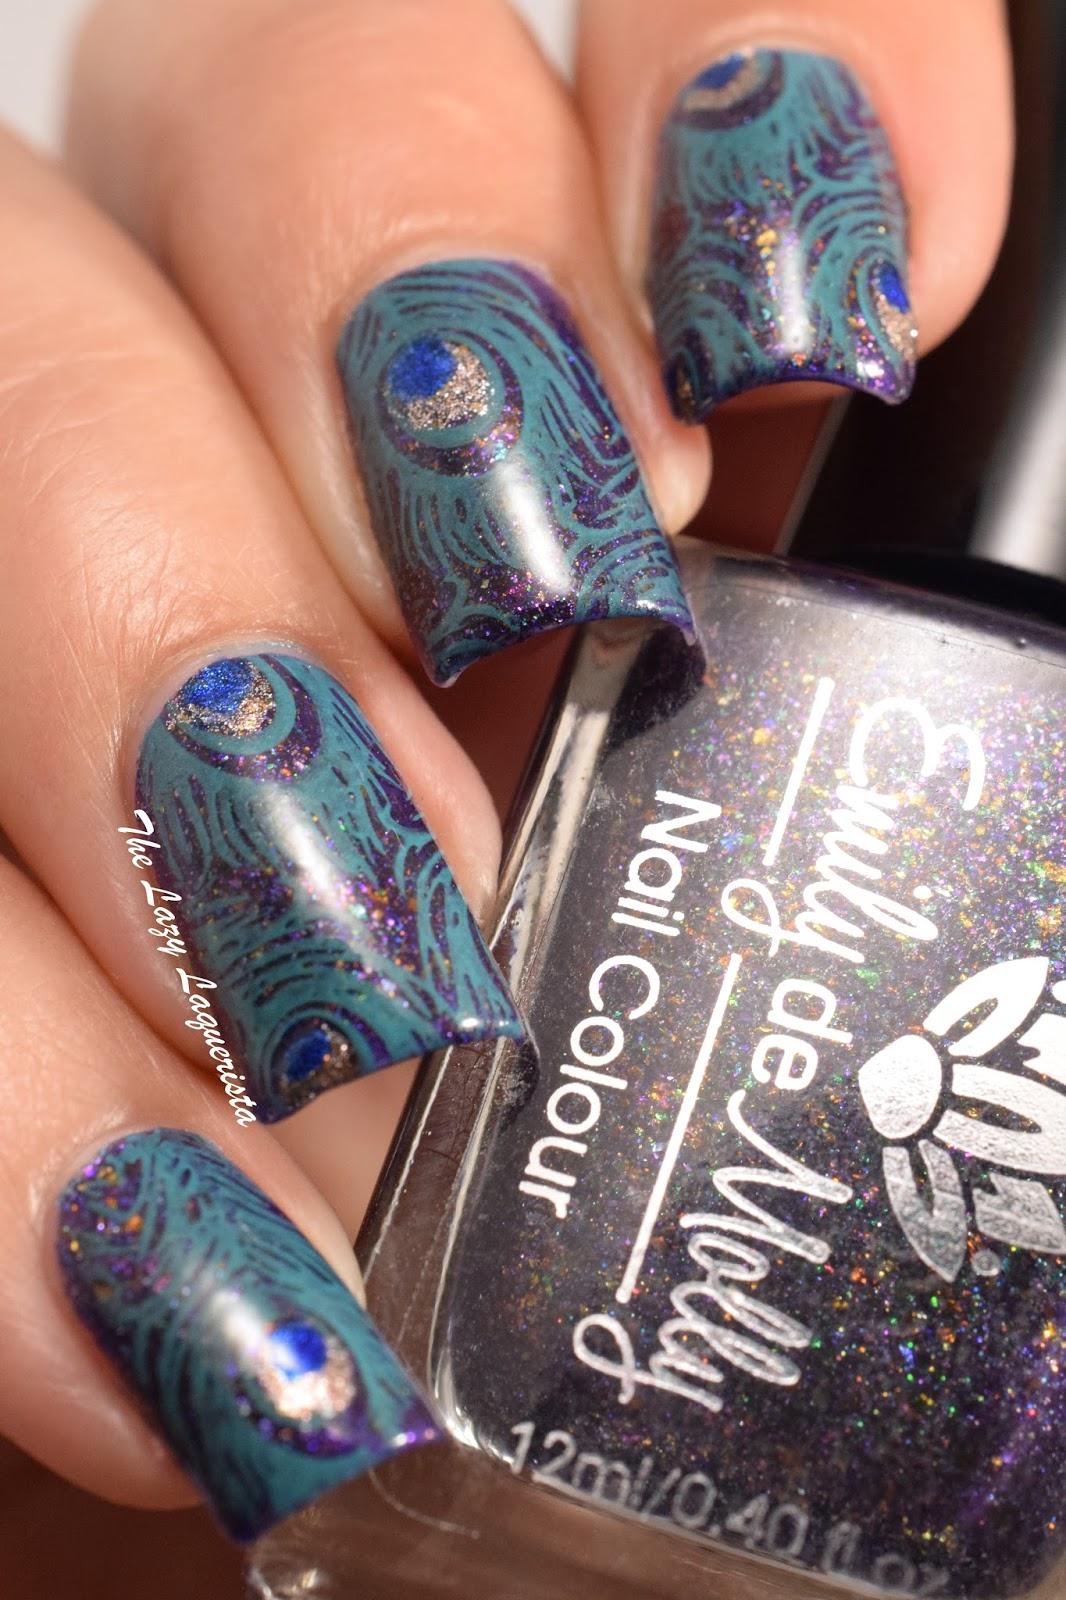 Glitter Bomb Nails - Keelys Nails